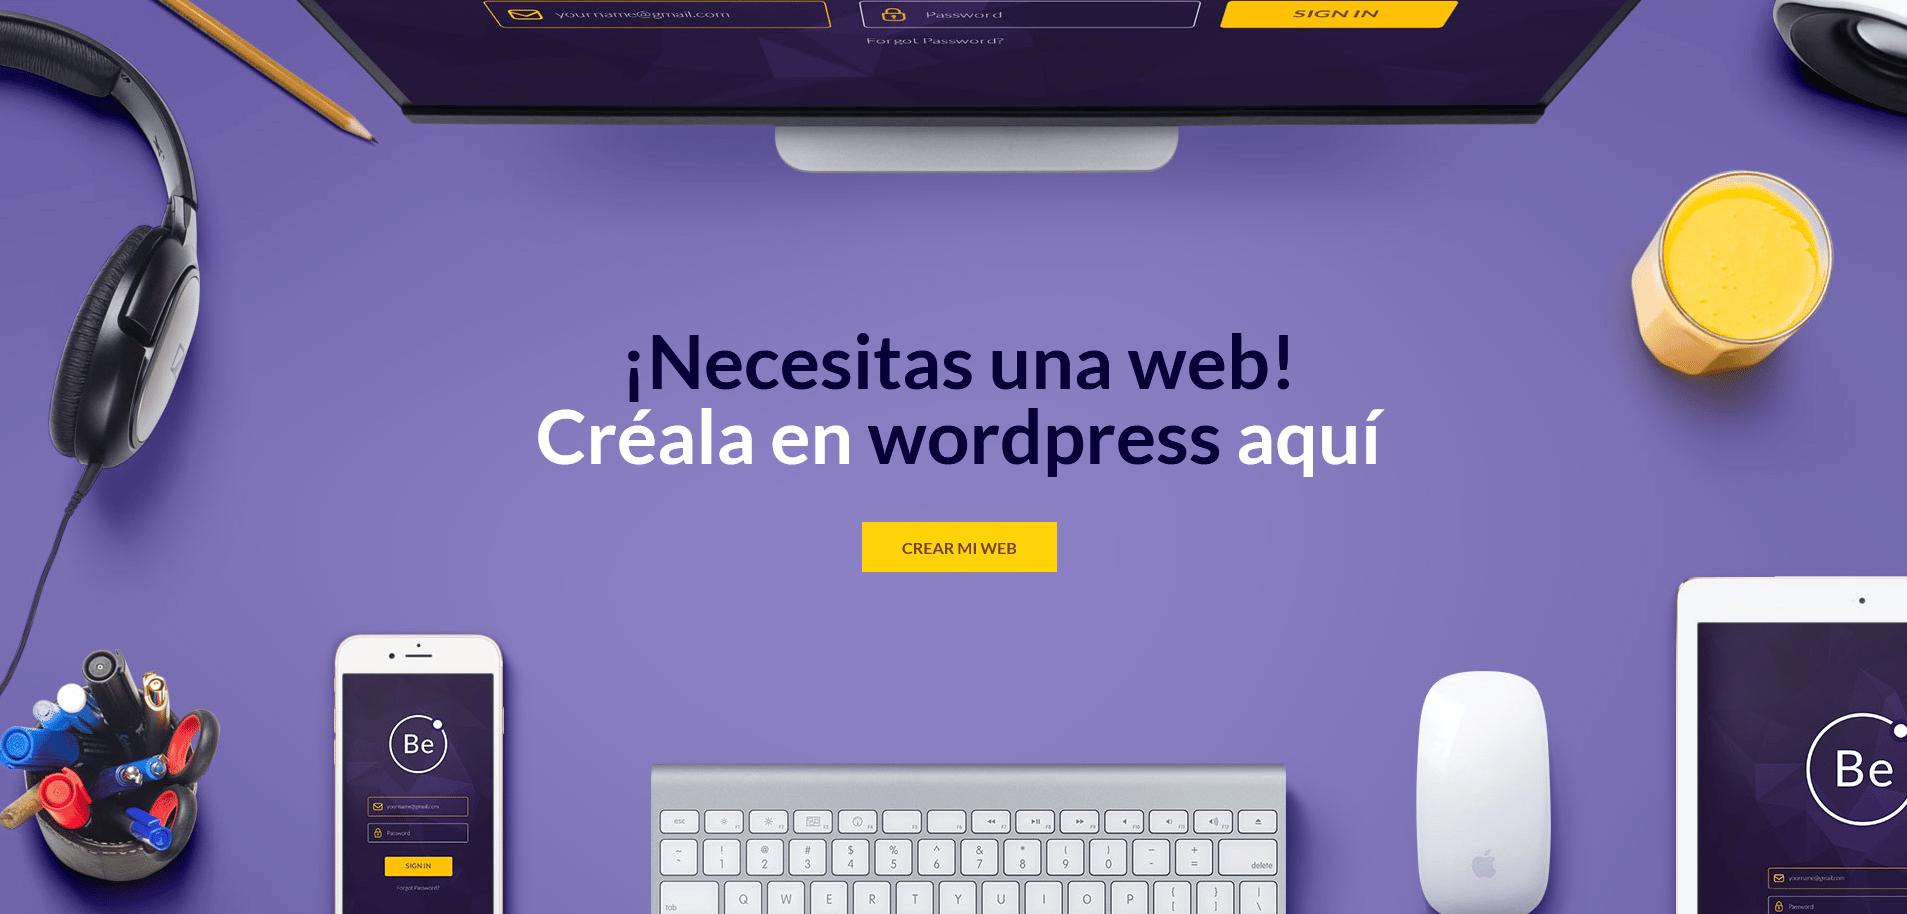 Diego Garcia Cuesta - crea tu web en wordpress